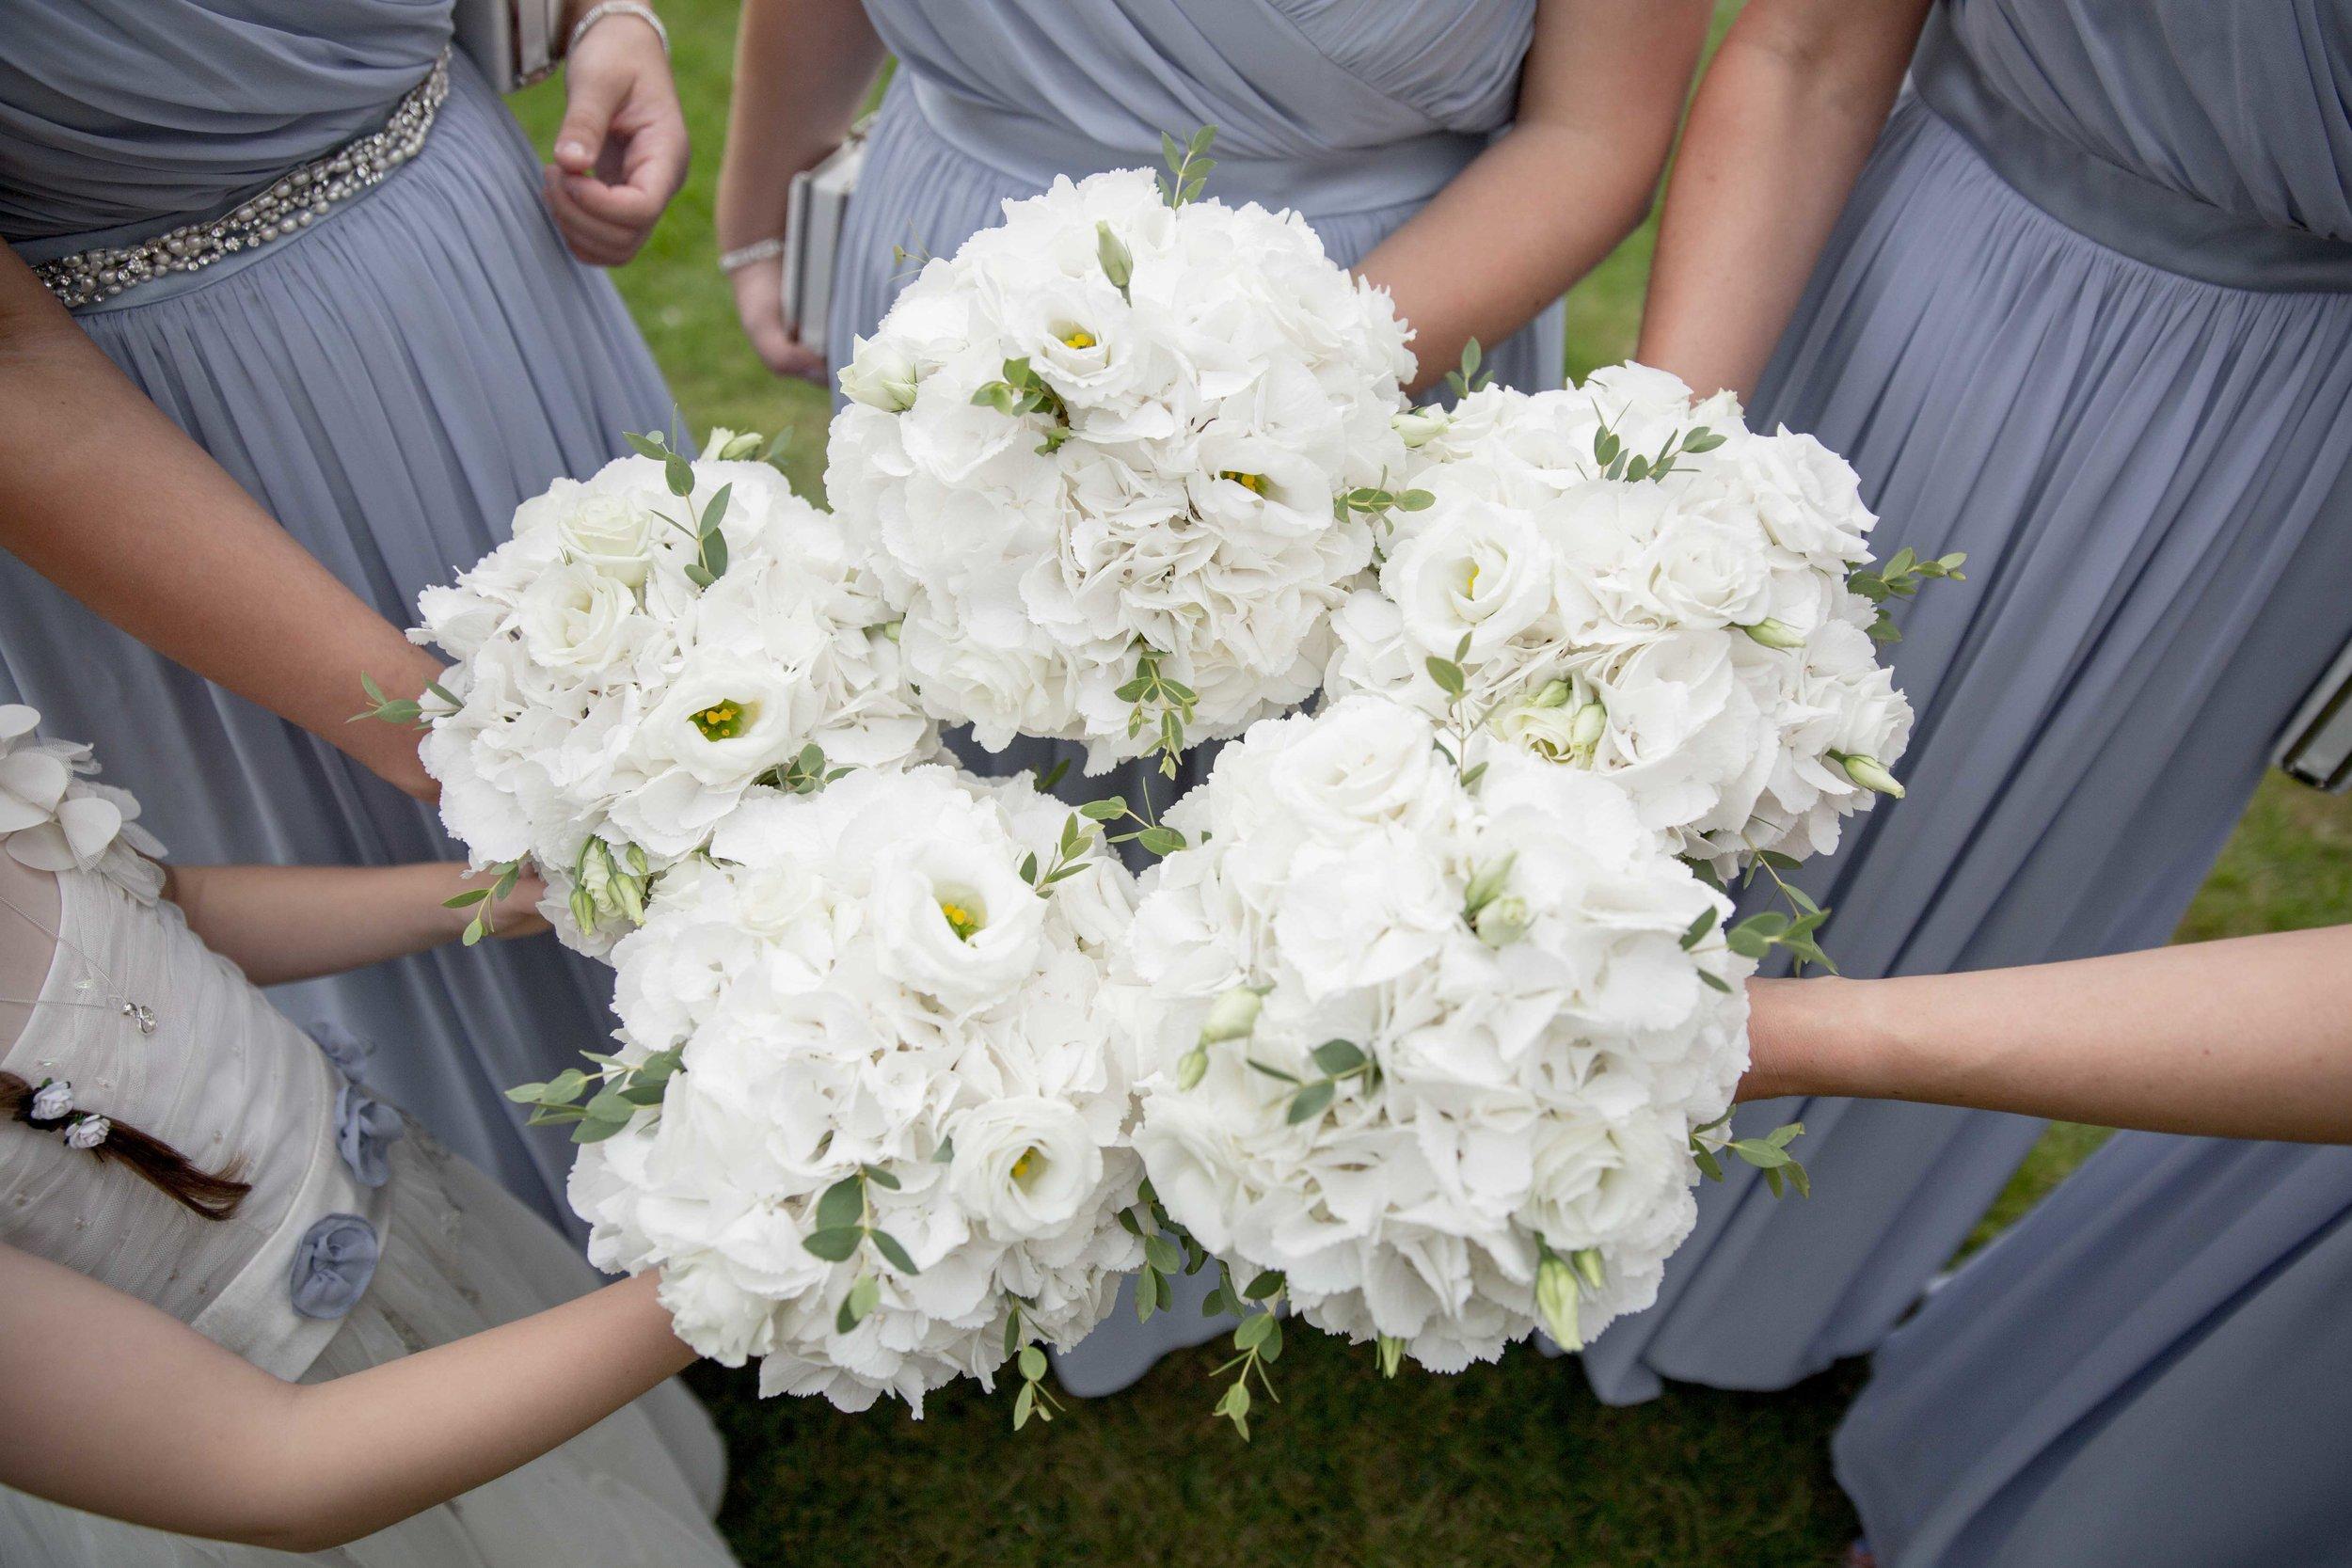 cotswold-wedding-photography-at-stonehouse-court-hotel-natalia-smith-photography-gloucestershire-wedding-photographer-5.jpg